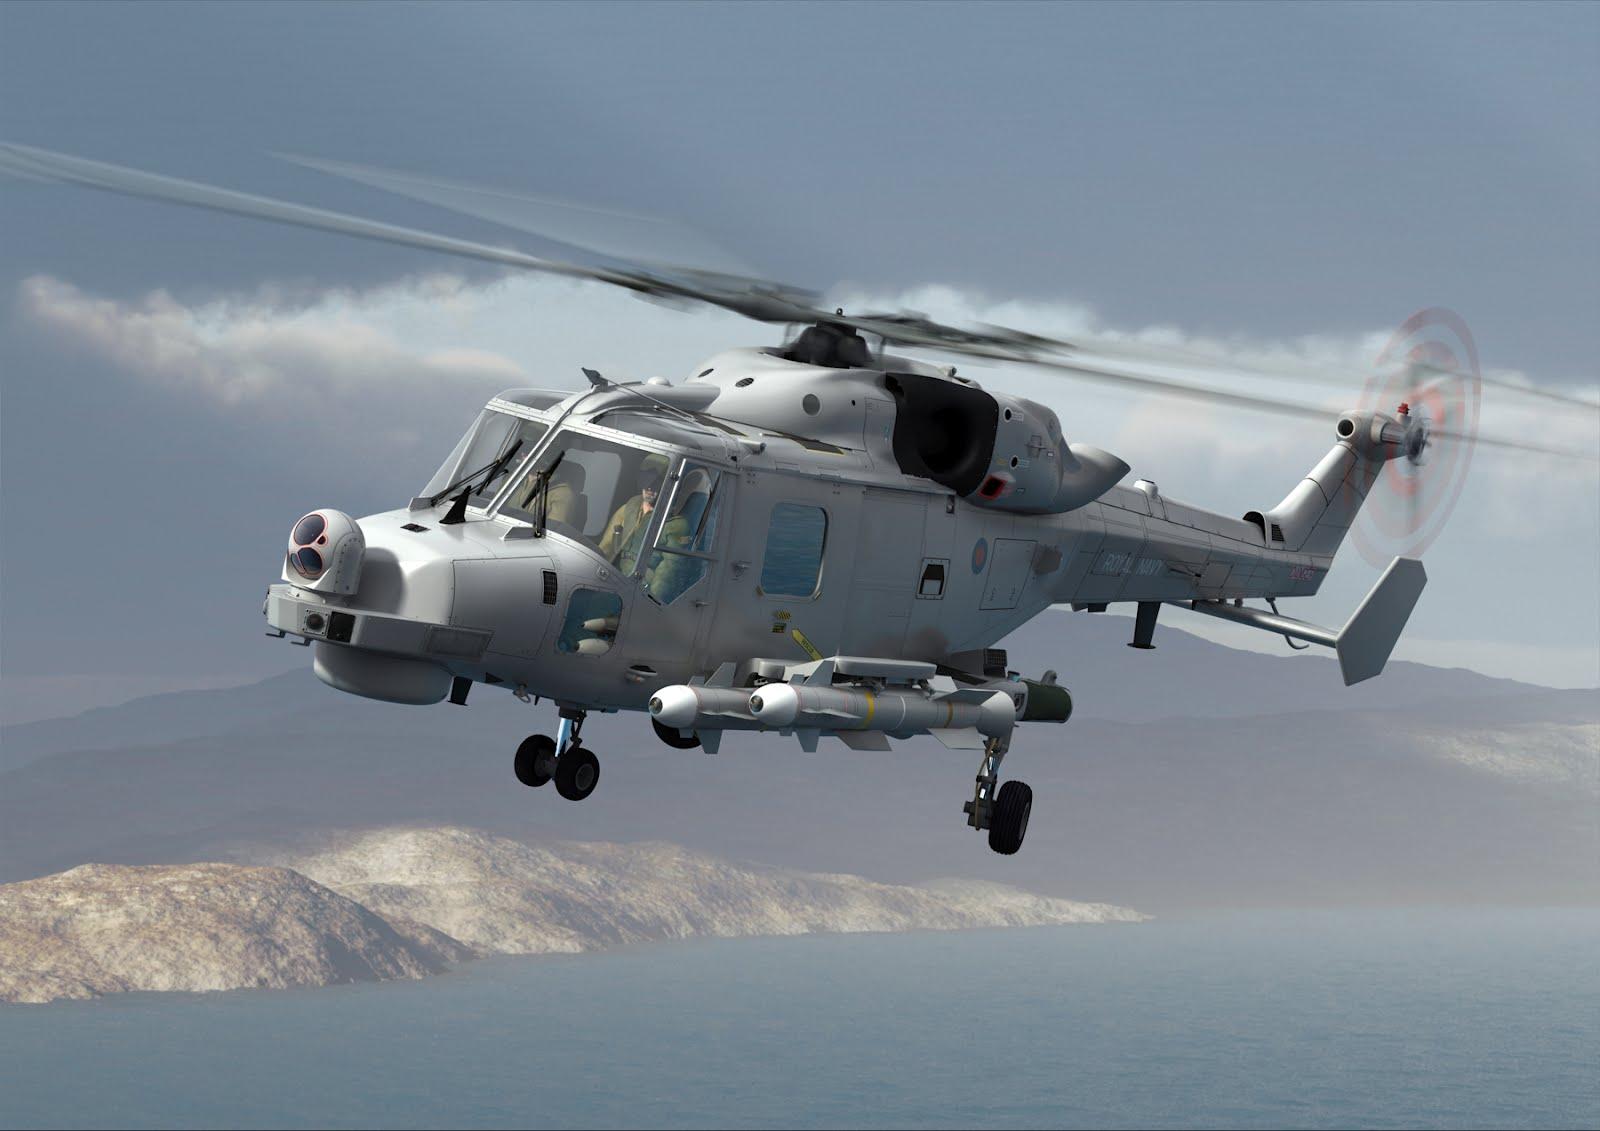 Osprey Elicottero : Aw lynx wildcat battlefield reconnaissance helicopter